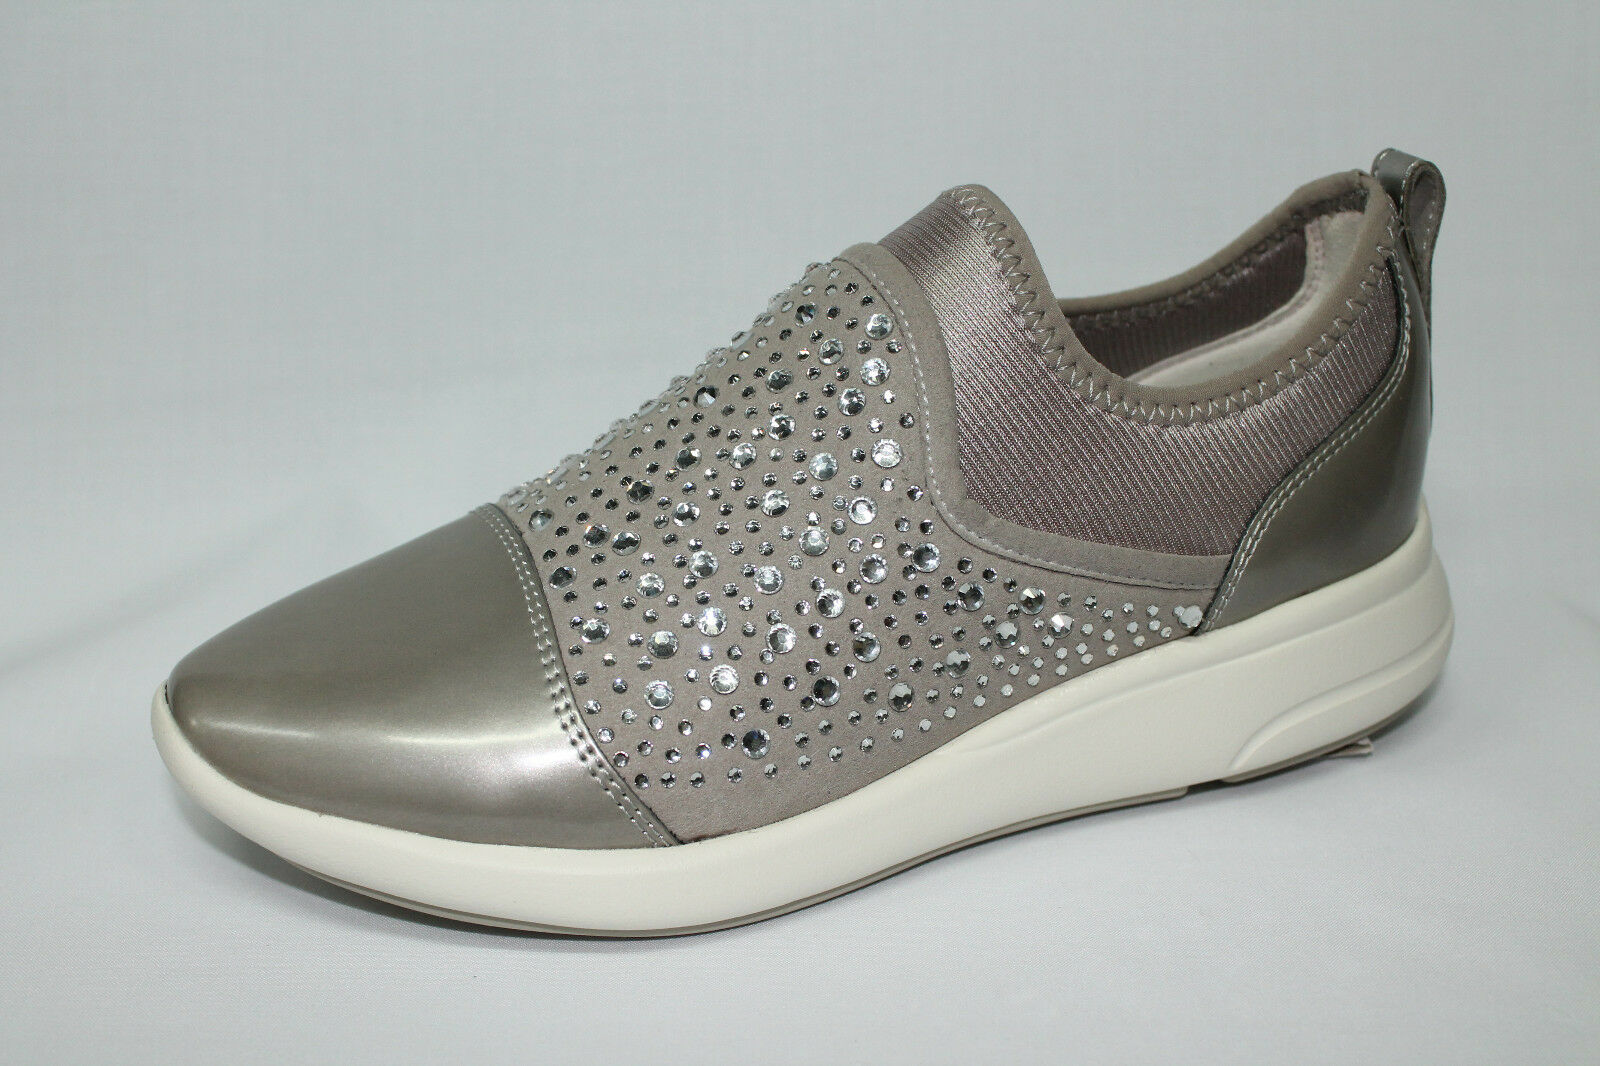 zapatos zapatillas Slip on Geox Geox Geox D Ophira B plata listino - 20%  alta calidad general